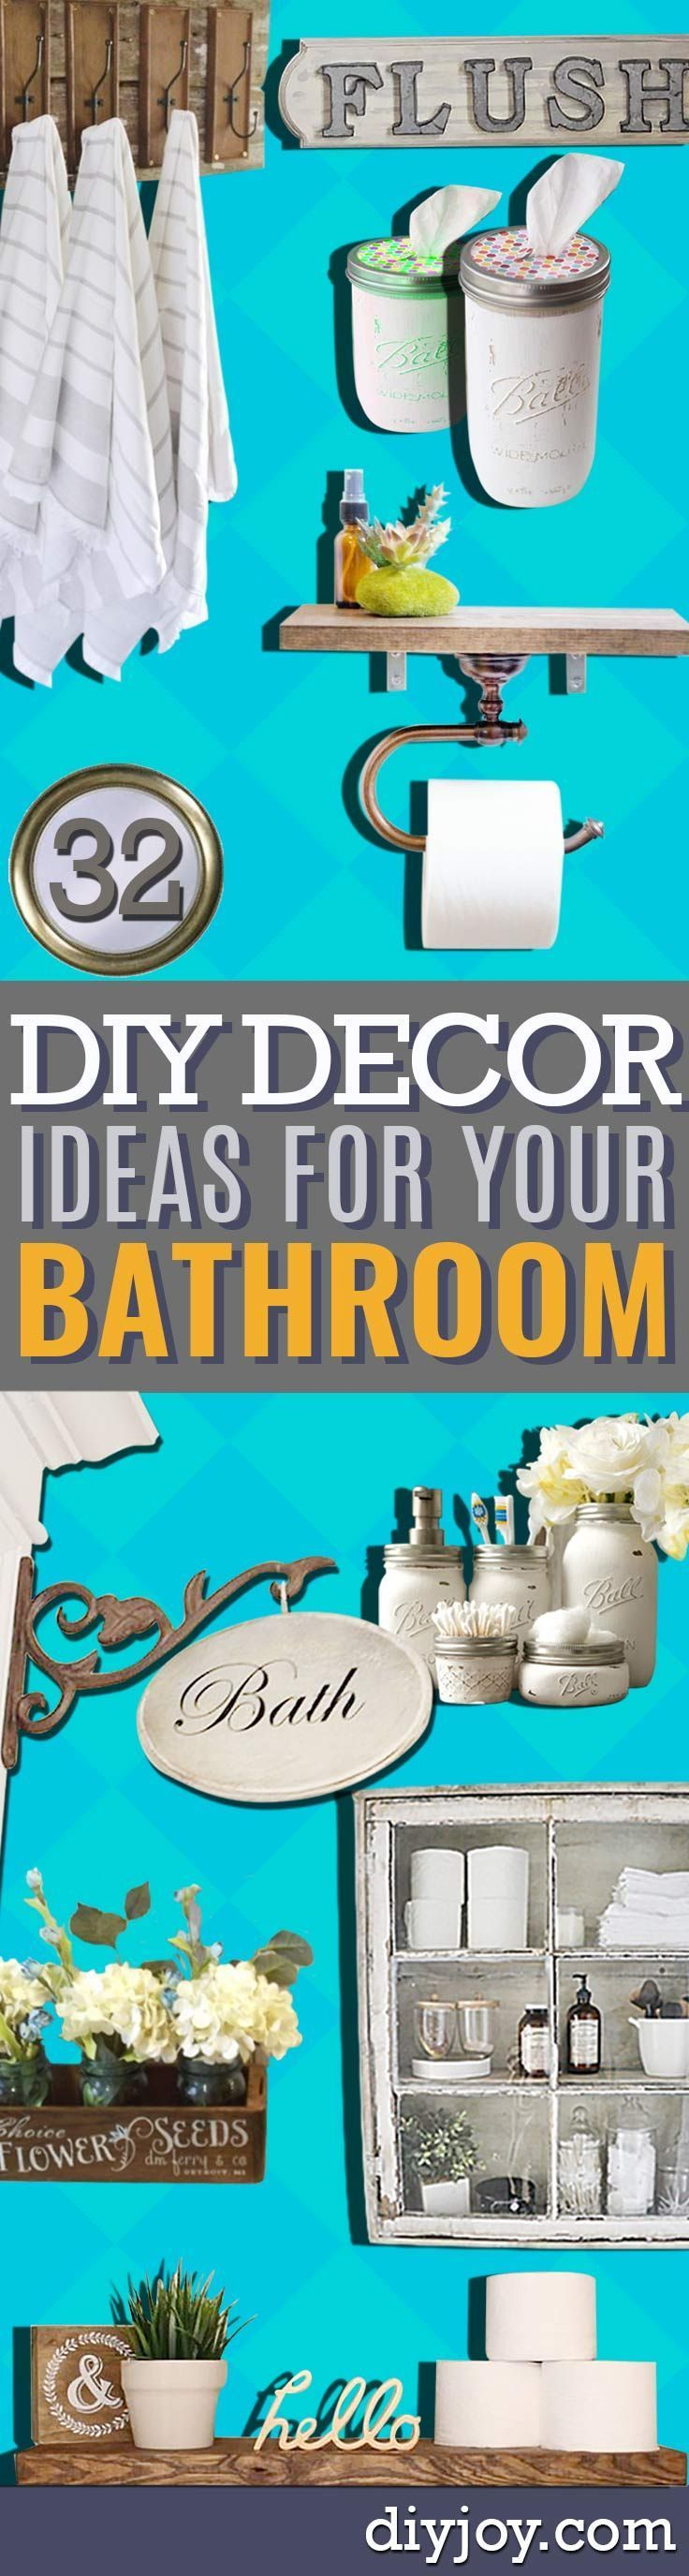 DIY Bathroom Decor Ideas – Coole Einrichtungsideen für Ihr Budget, rustikal …   – Decorations DIY – #Bathroom #Budget #Coole #decor #Decoratio